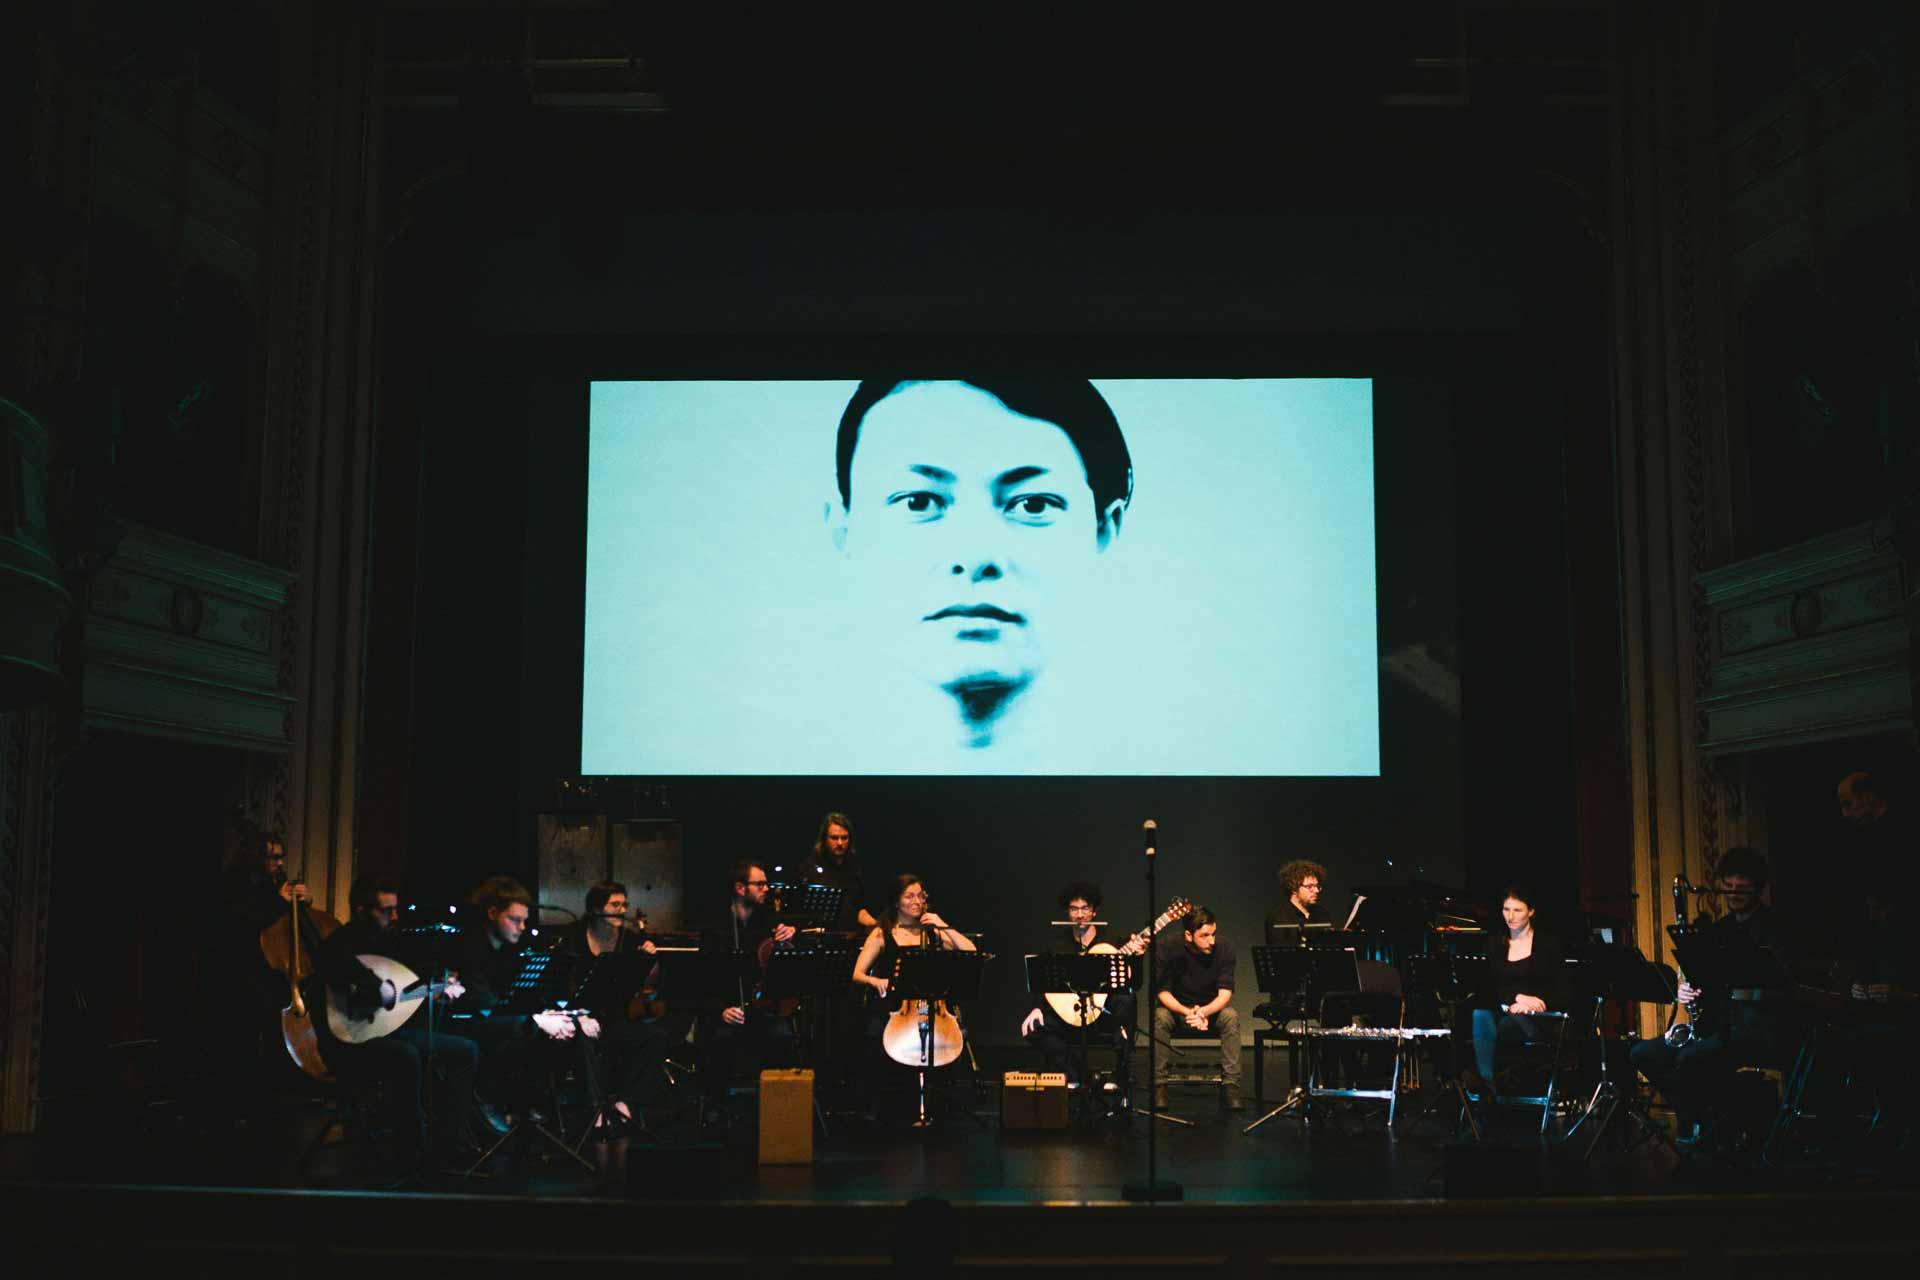 Archiwum Messiaen/Tage 2019